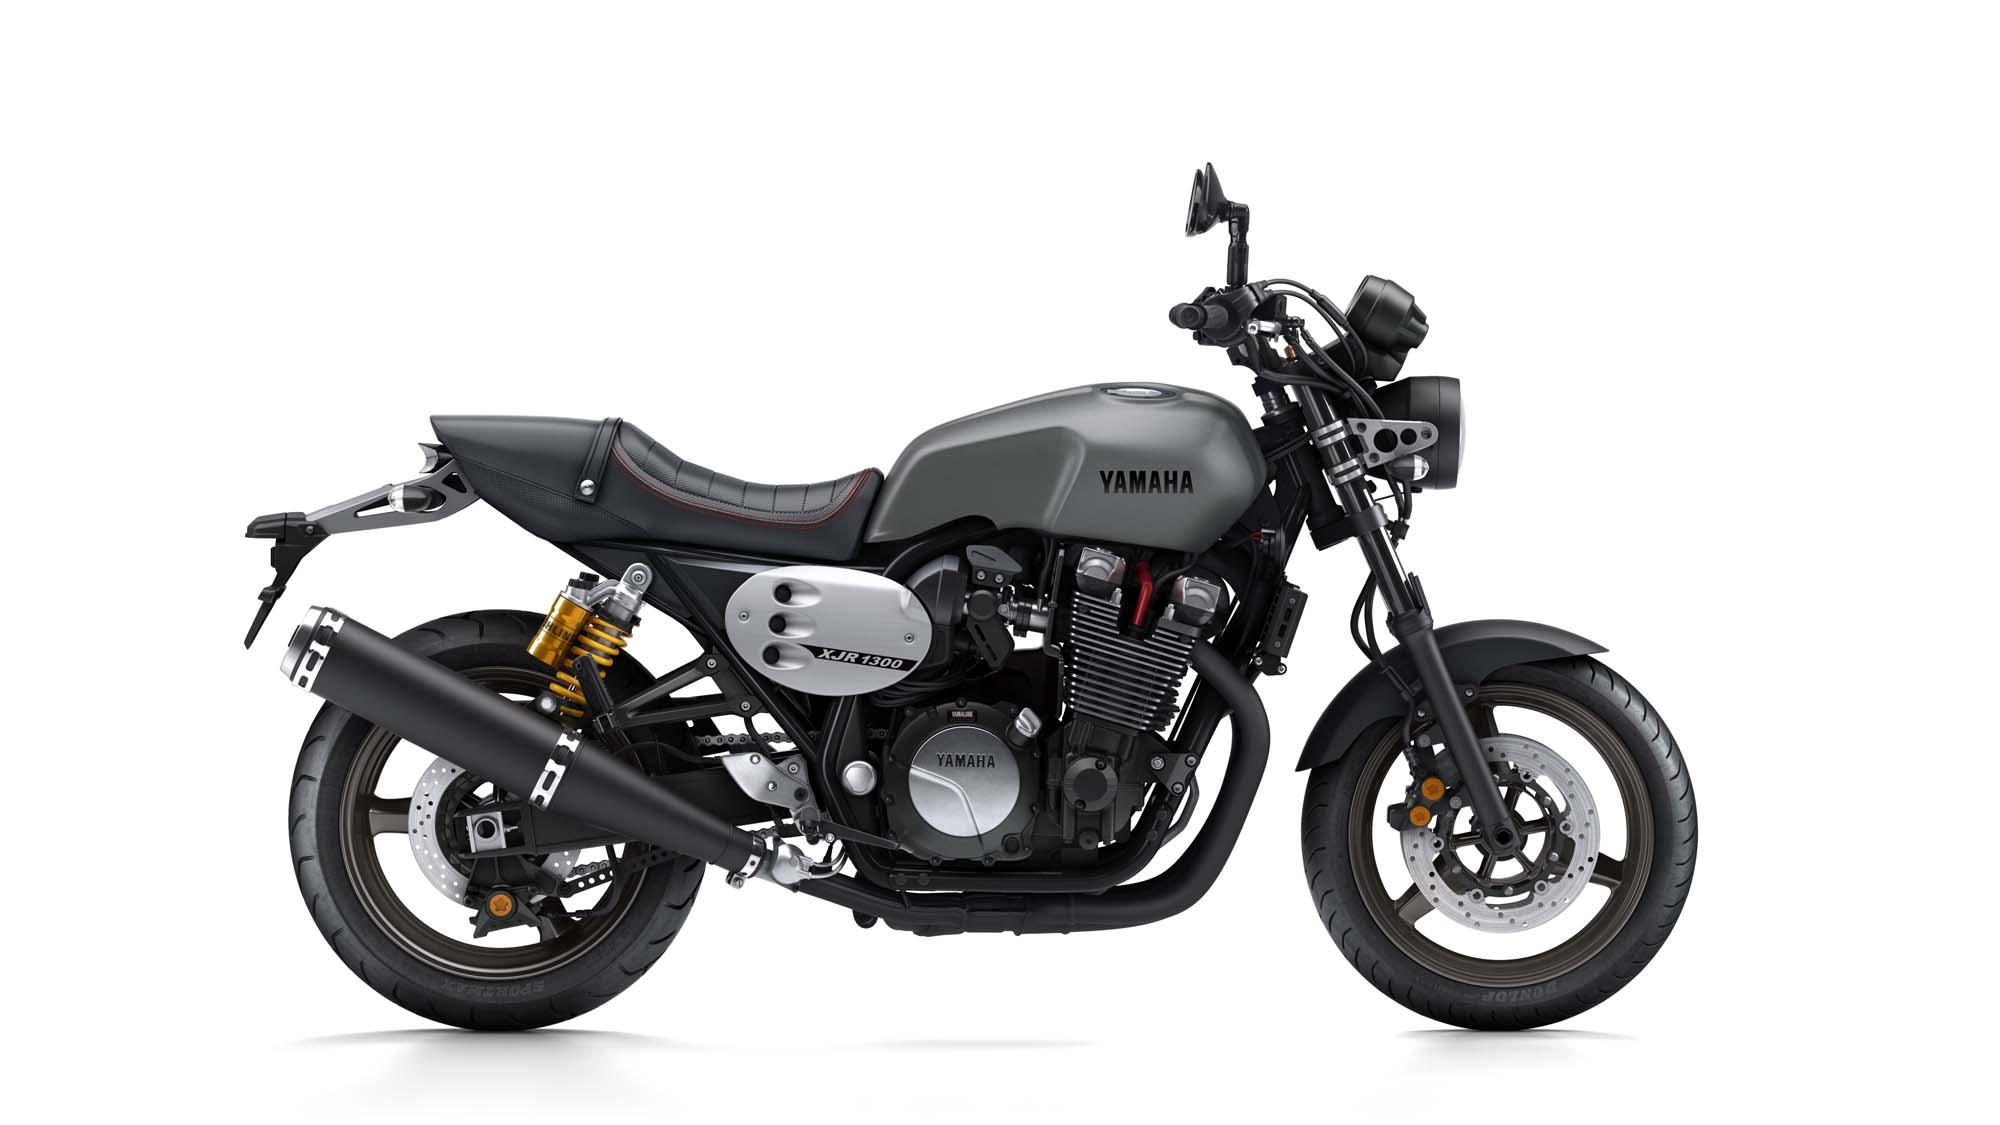 yamaha xjr 1300 das motorrad blog. Black Bedroom Furniture Sets. Home Design Ideas